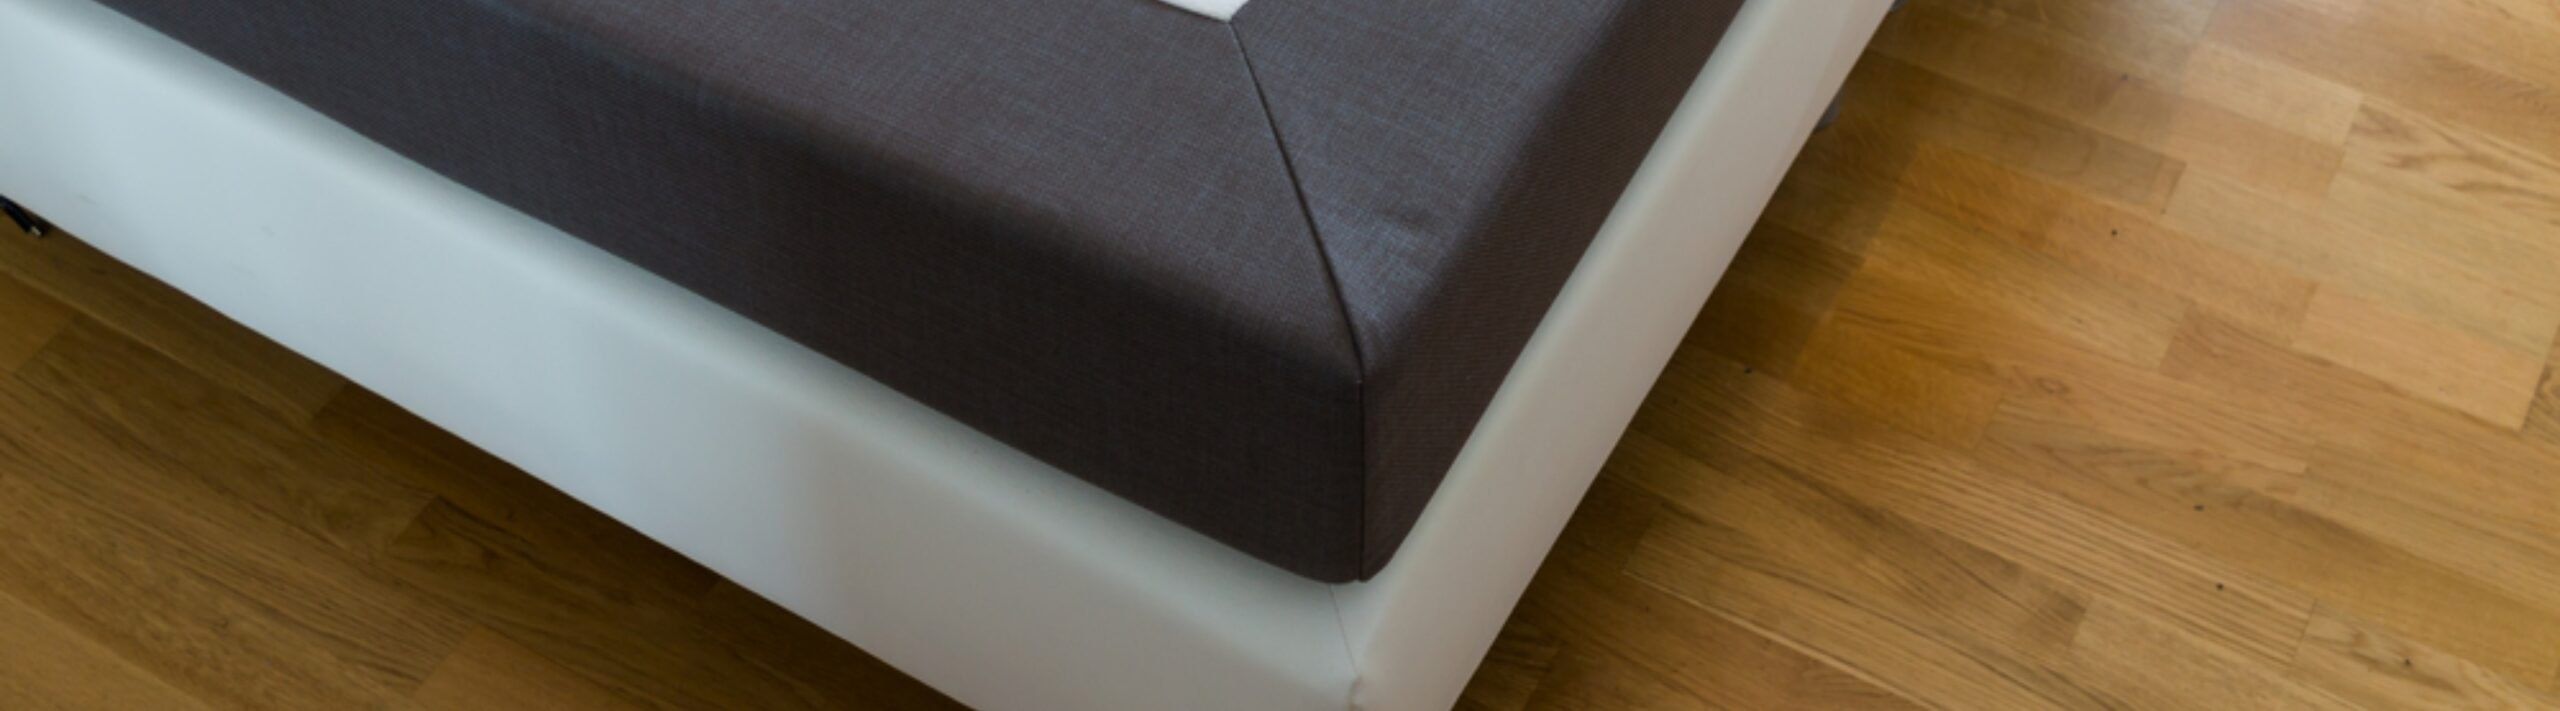 mattress on a box spring